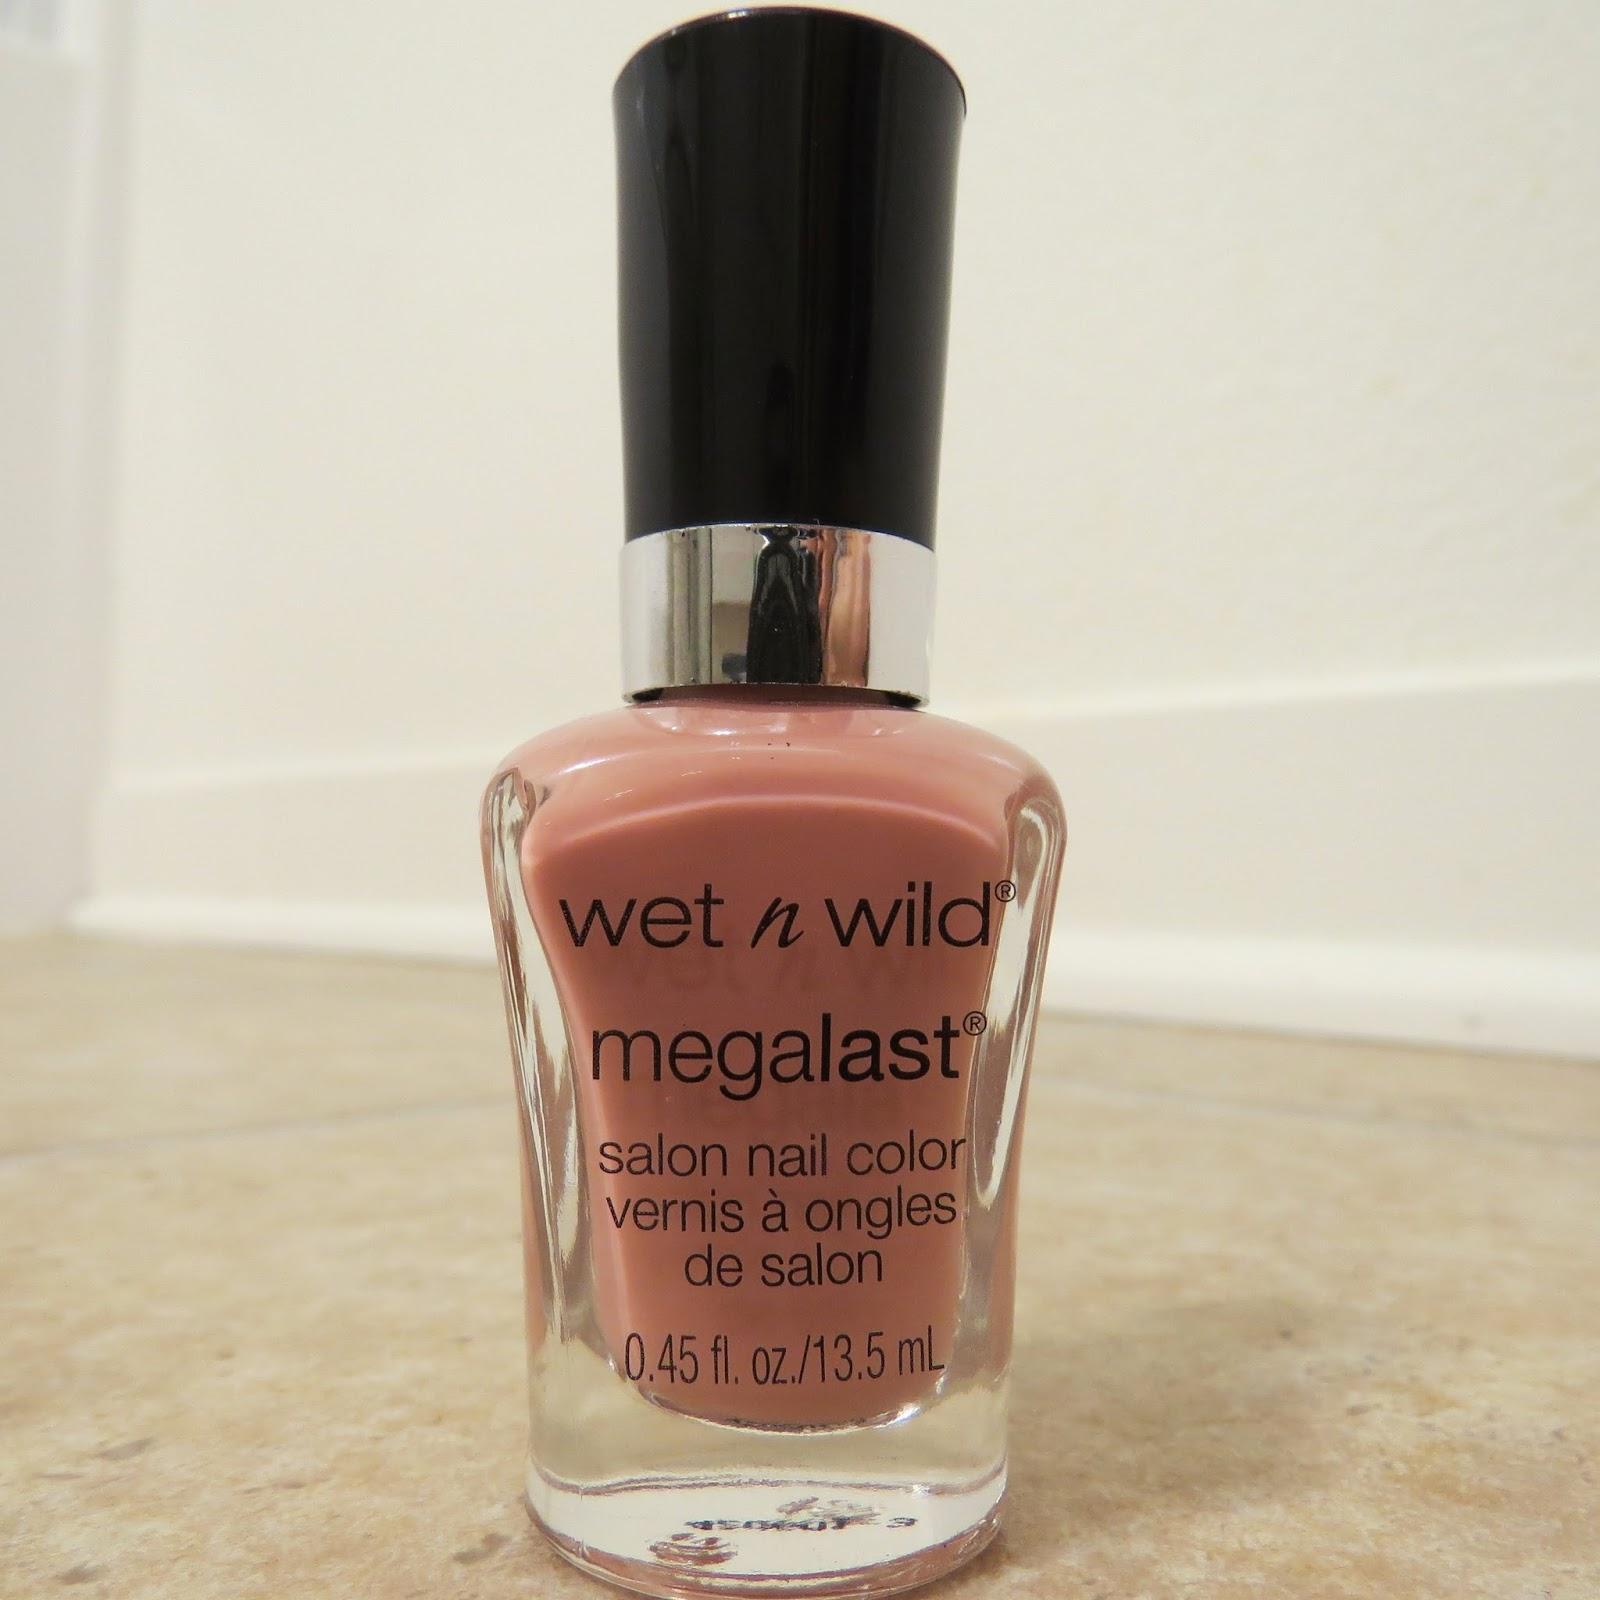 Rite Aid Haul - Wet N Wild Megalast Salon Nail Color